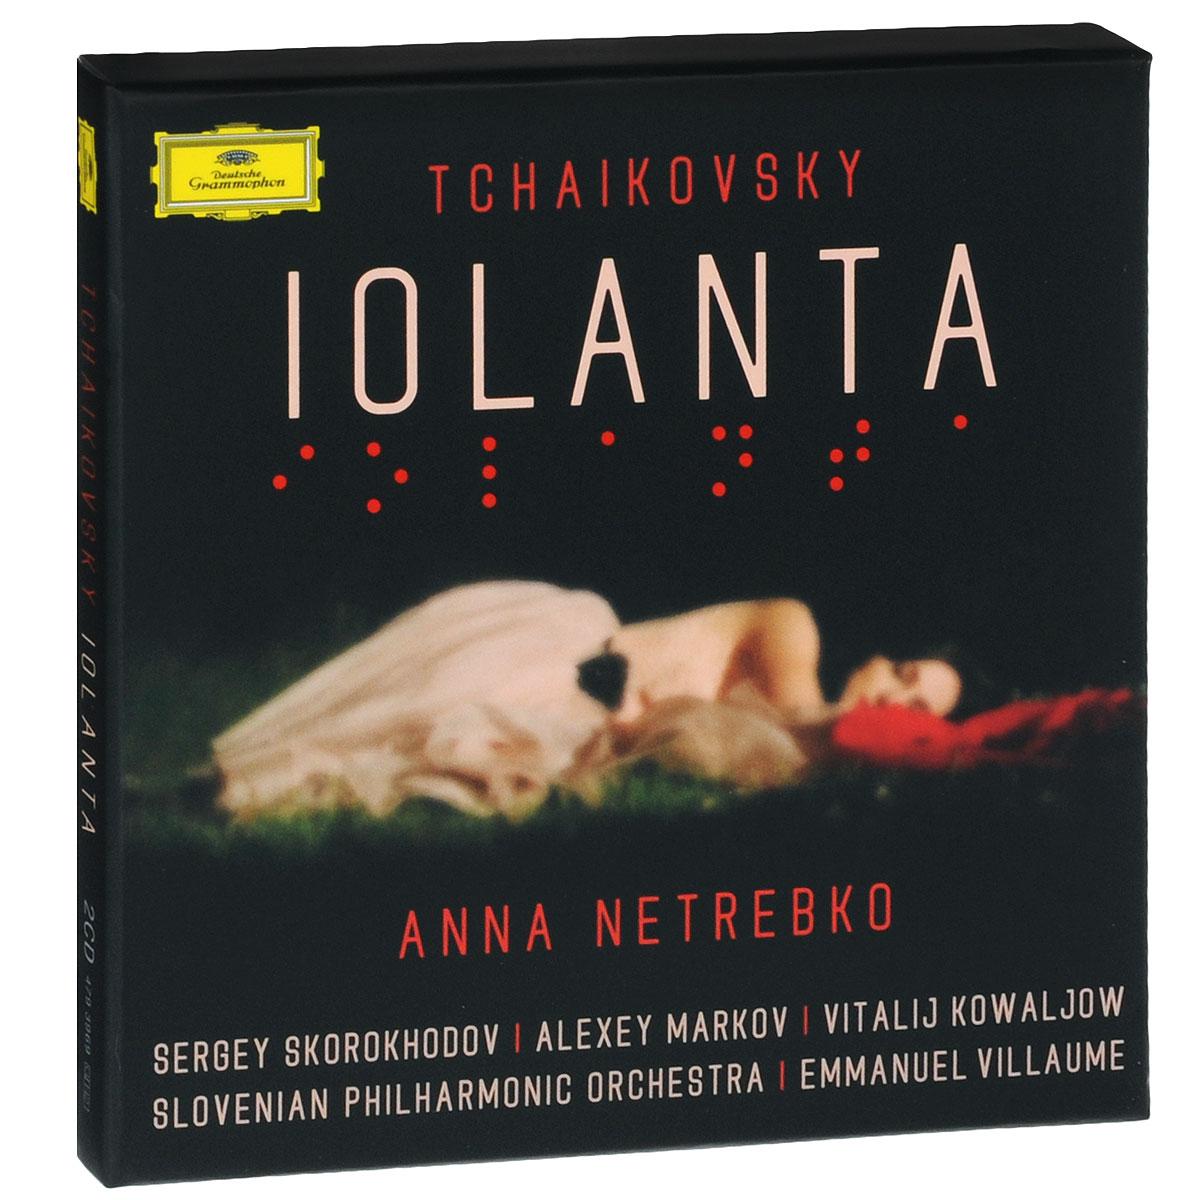 Анна Нетребко Anna Netrebko. Pyotr Tchaikovsky. Iolanta (2 CD) анна нетребко лондон